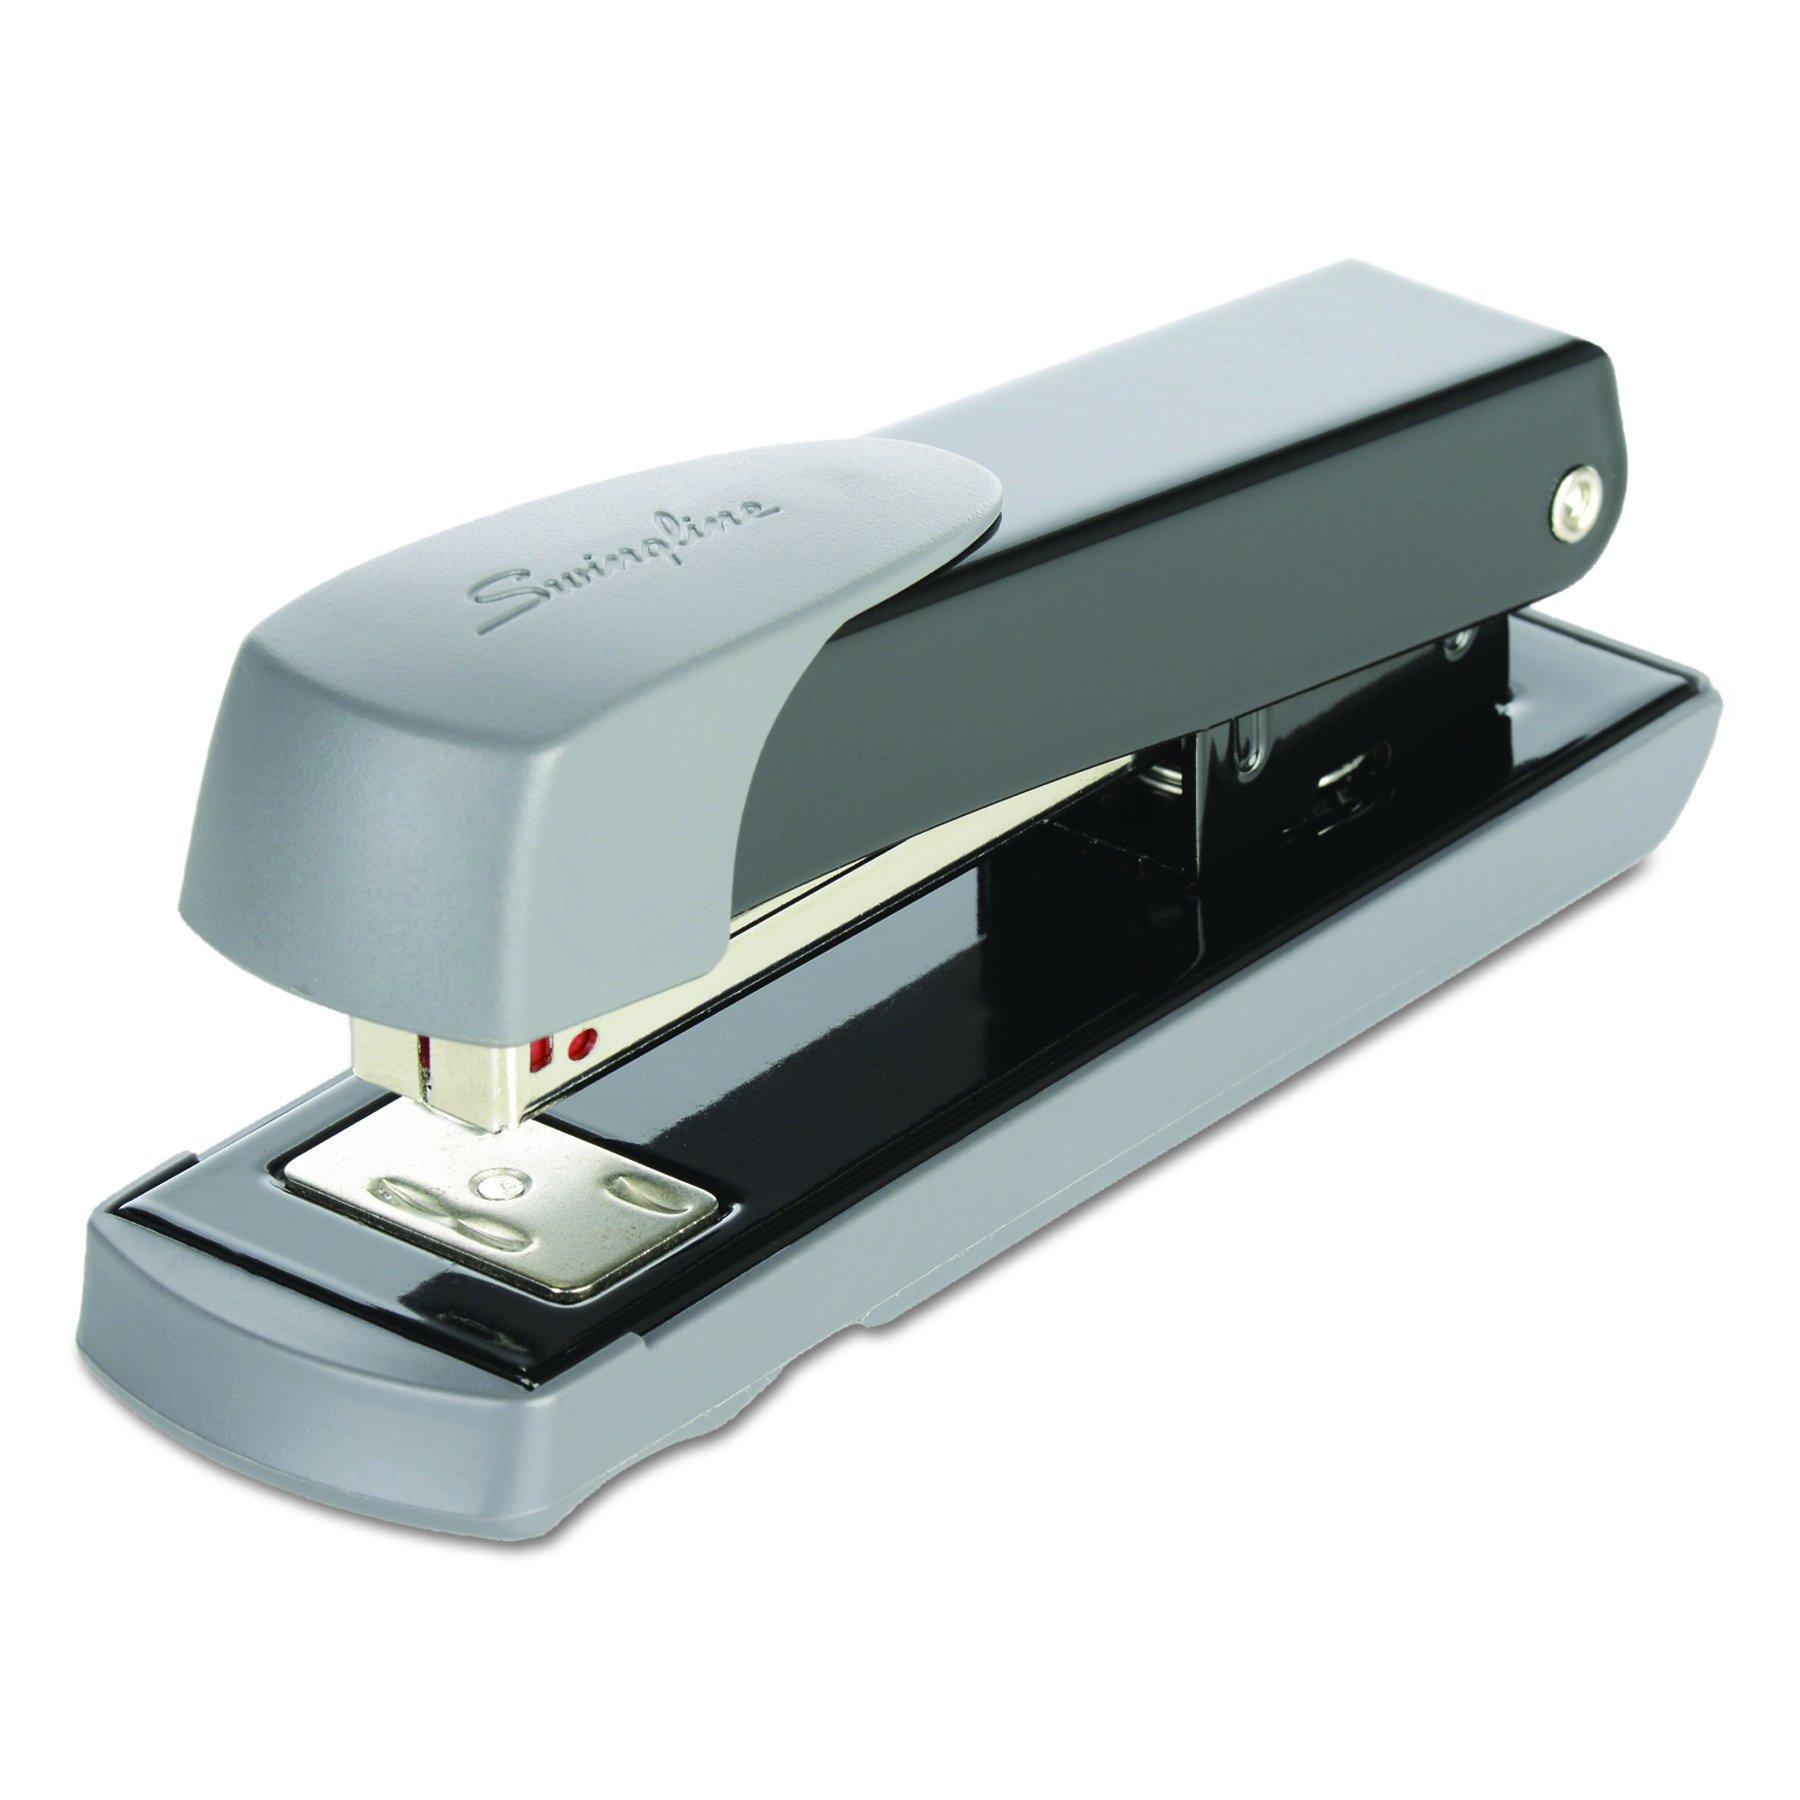 Swingline 71101 Compact Commercial Stapler, Half Strip, 20-Sheet Capacity, Black